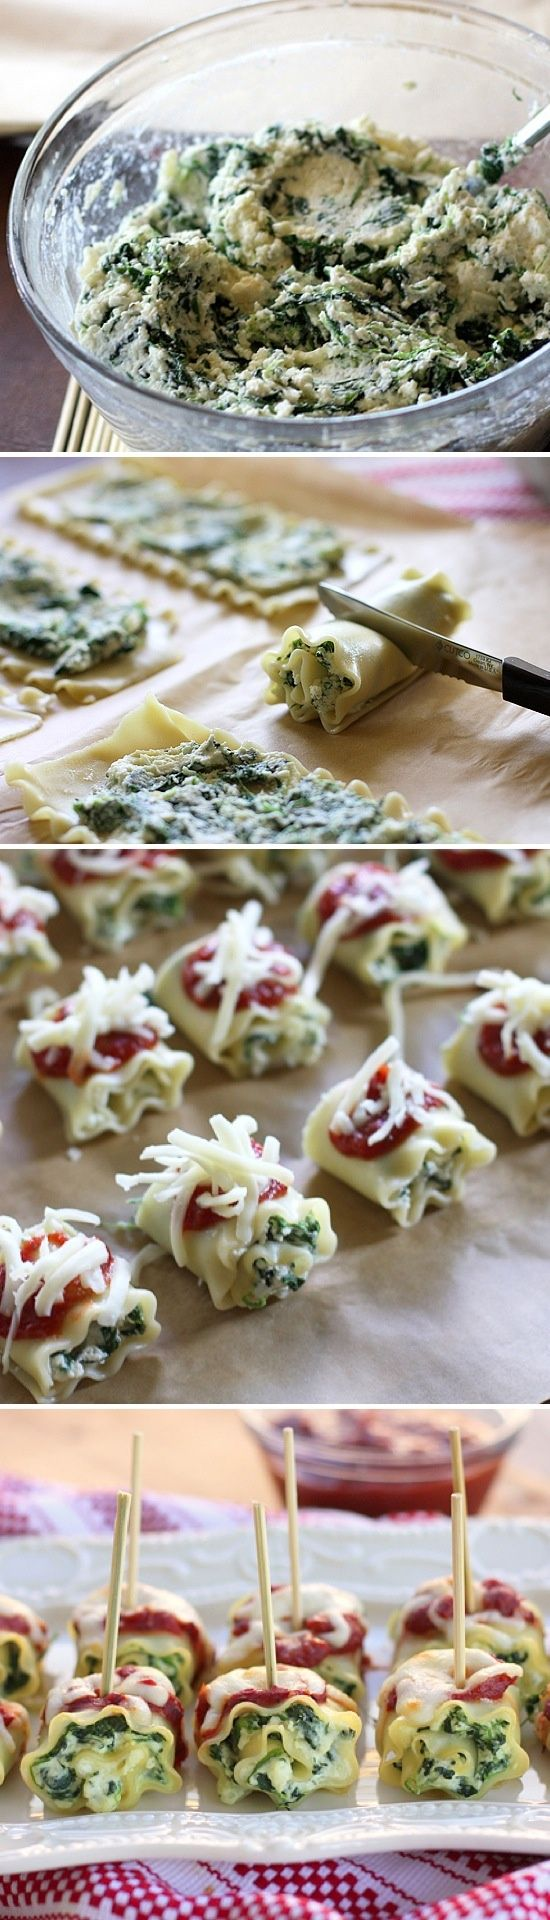 Mini Spinach Lasagna Roll-Ups: Ricotta, salt, pepper, spinach, Parmesan, and cream or bechamel sauce.